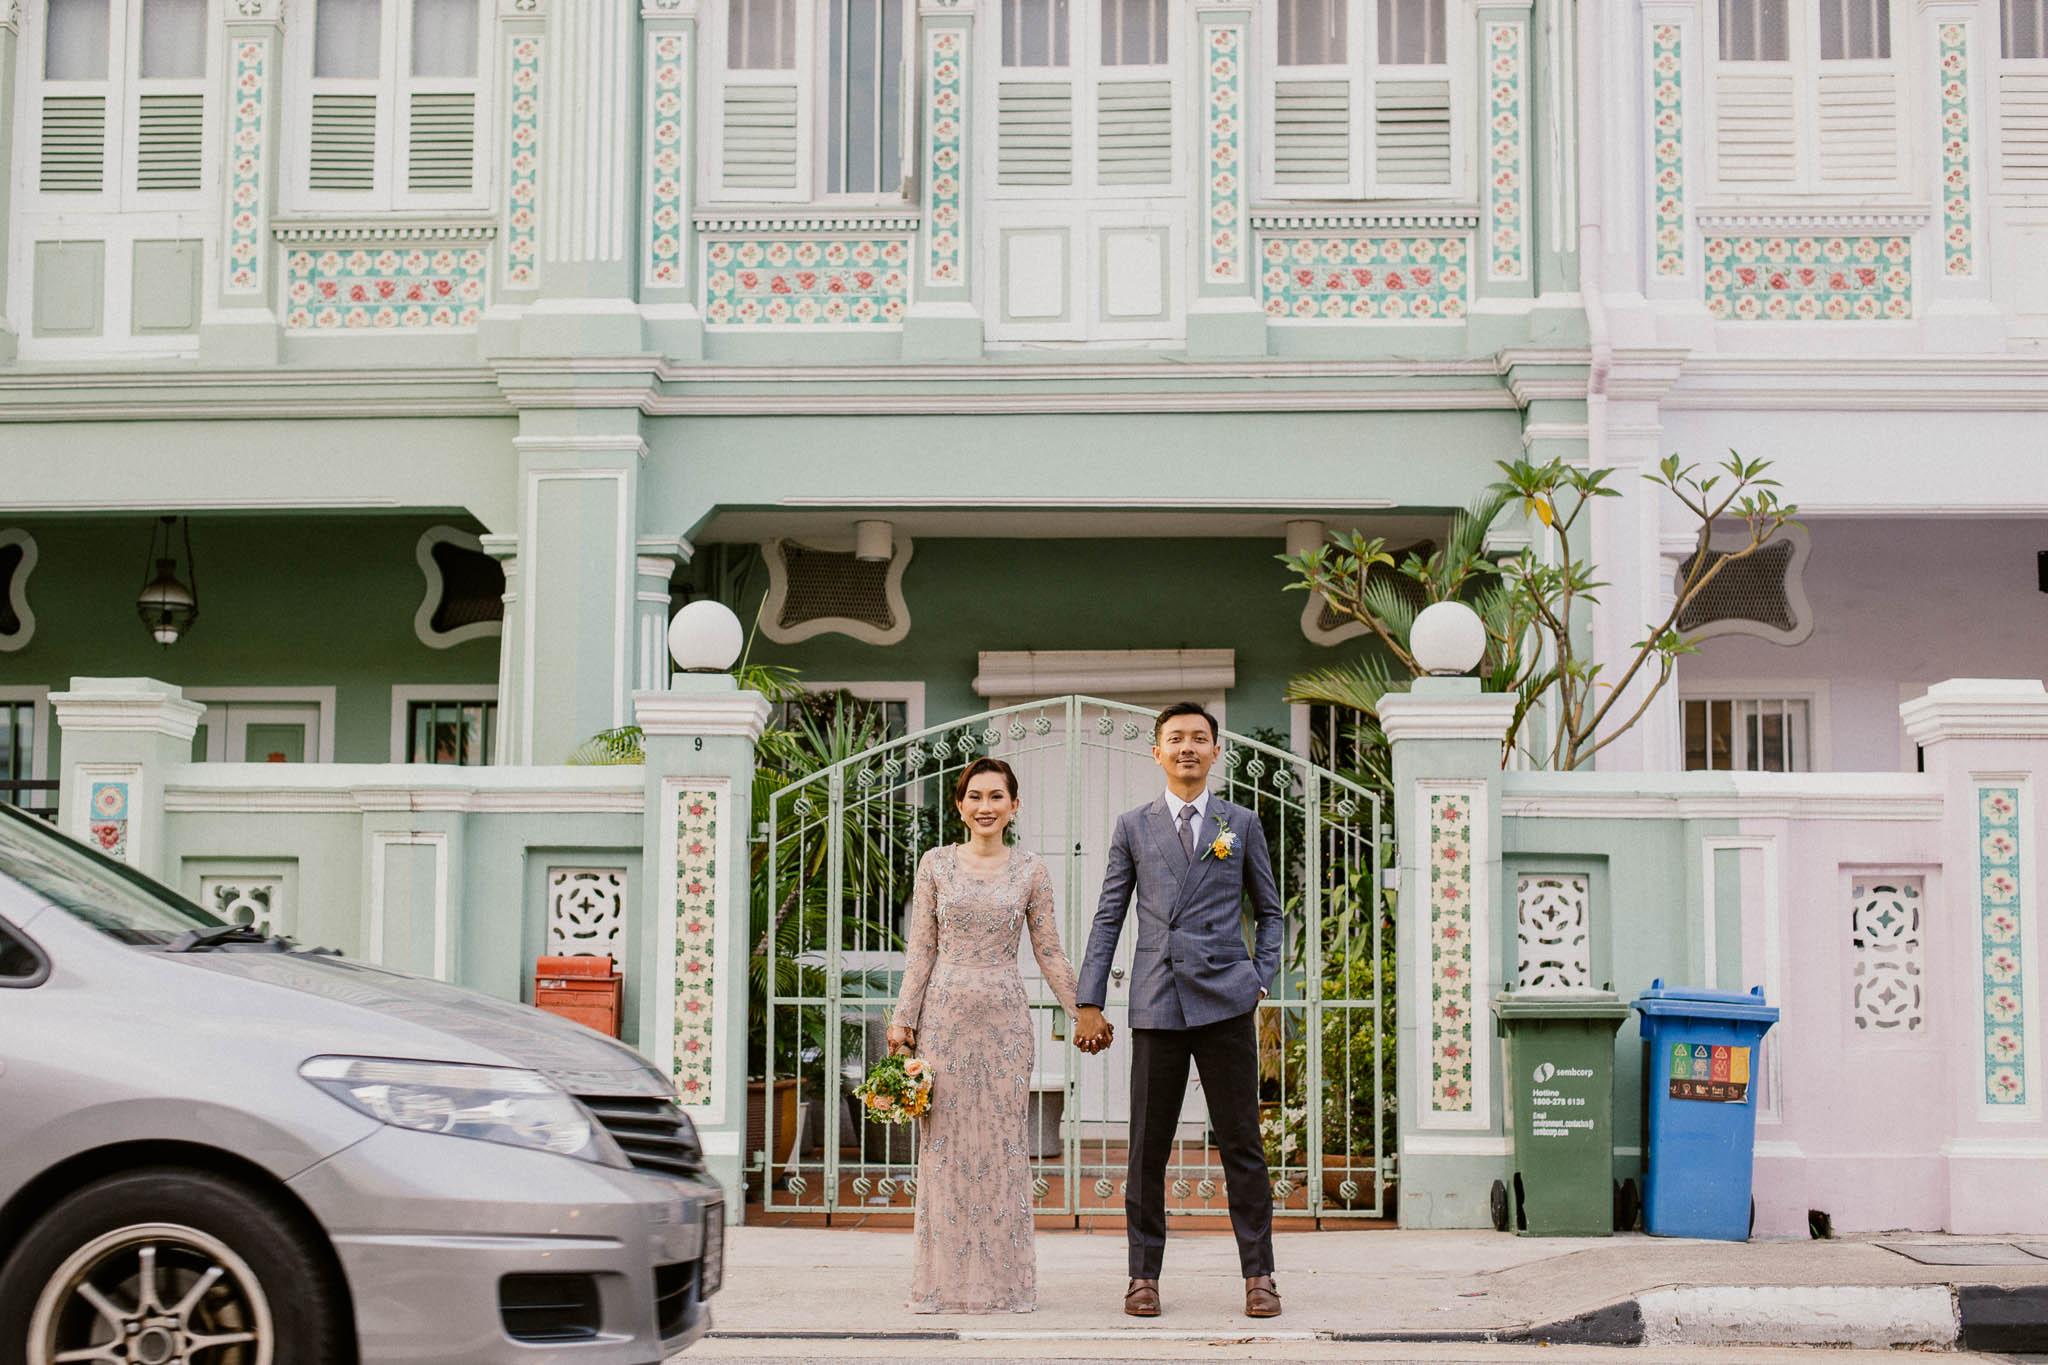 singapore-wedding-photographer-wedding-nufail-addafiq-078.jpg